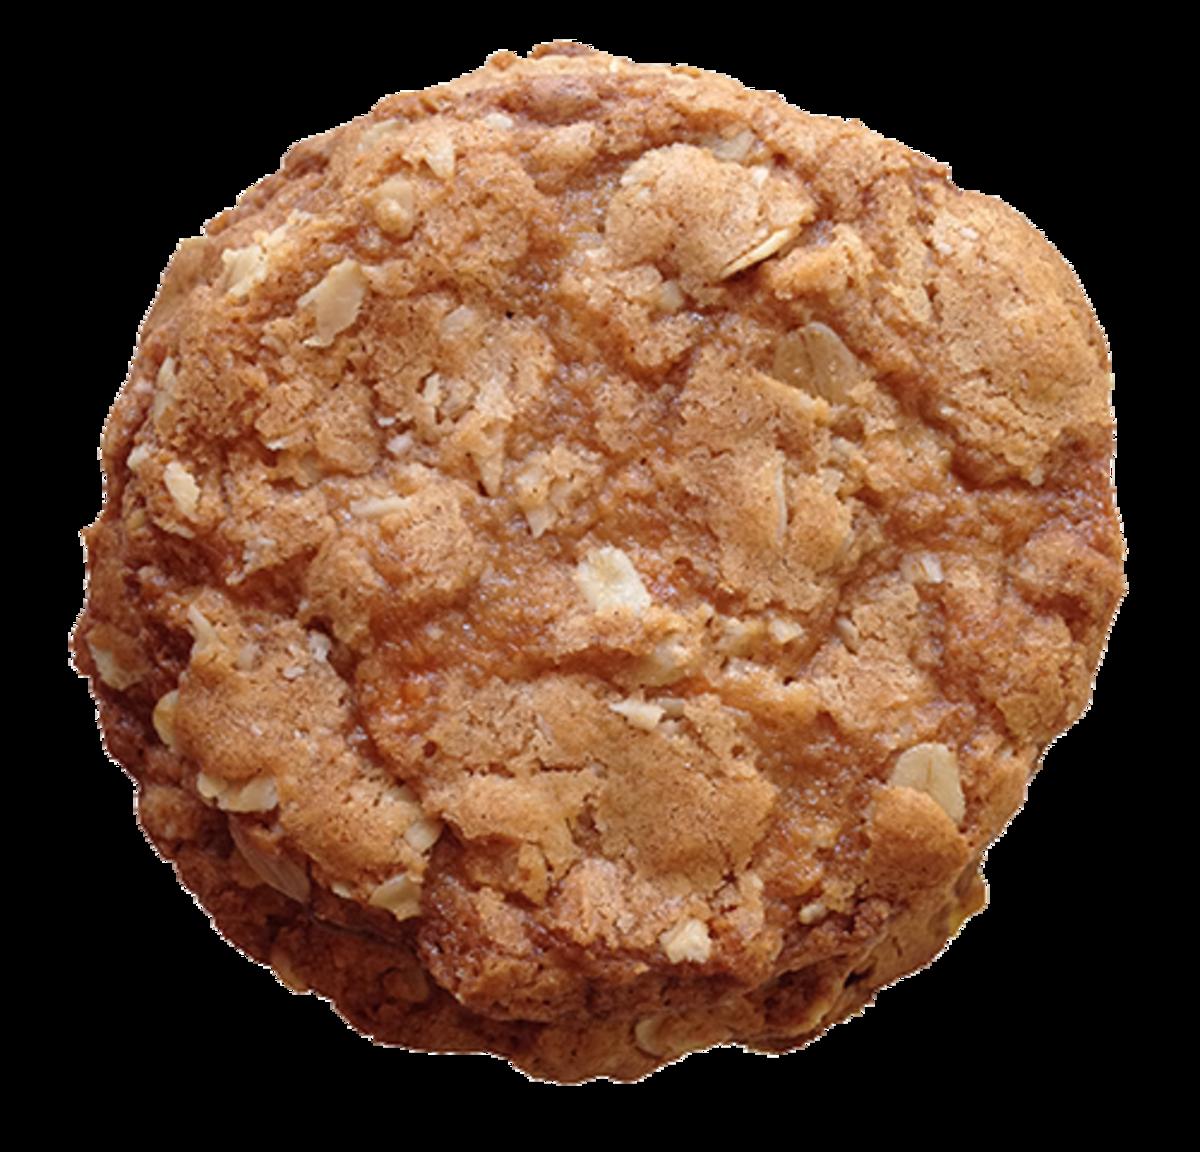 Pumpkin Spice Oatmeal Cookie Close-Up